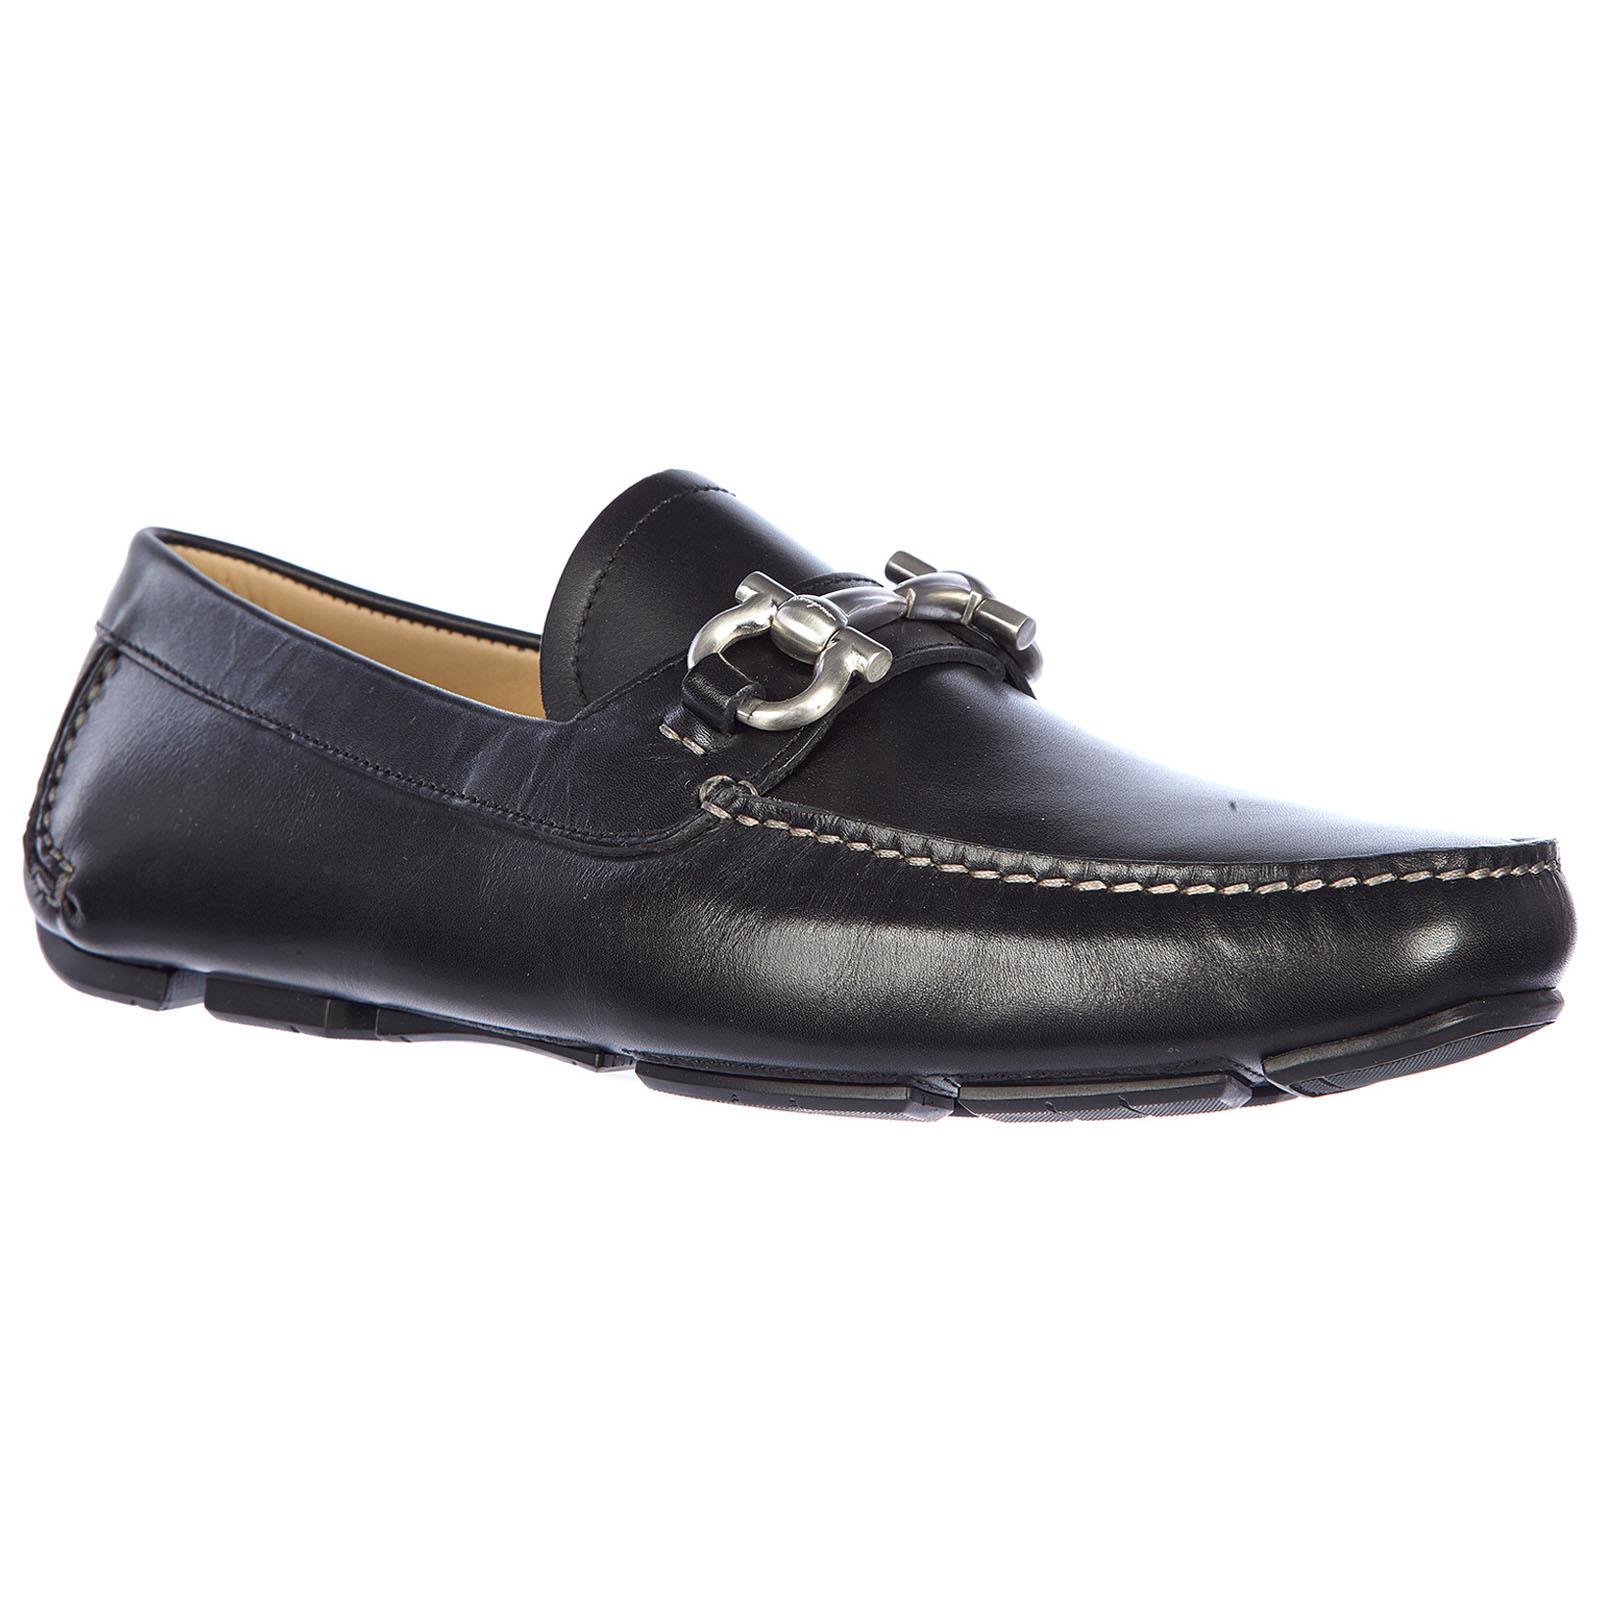 Men's leather loafers moccasins  parigi calf